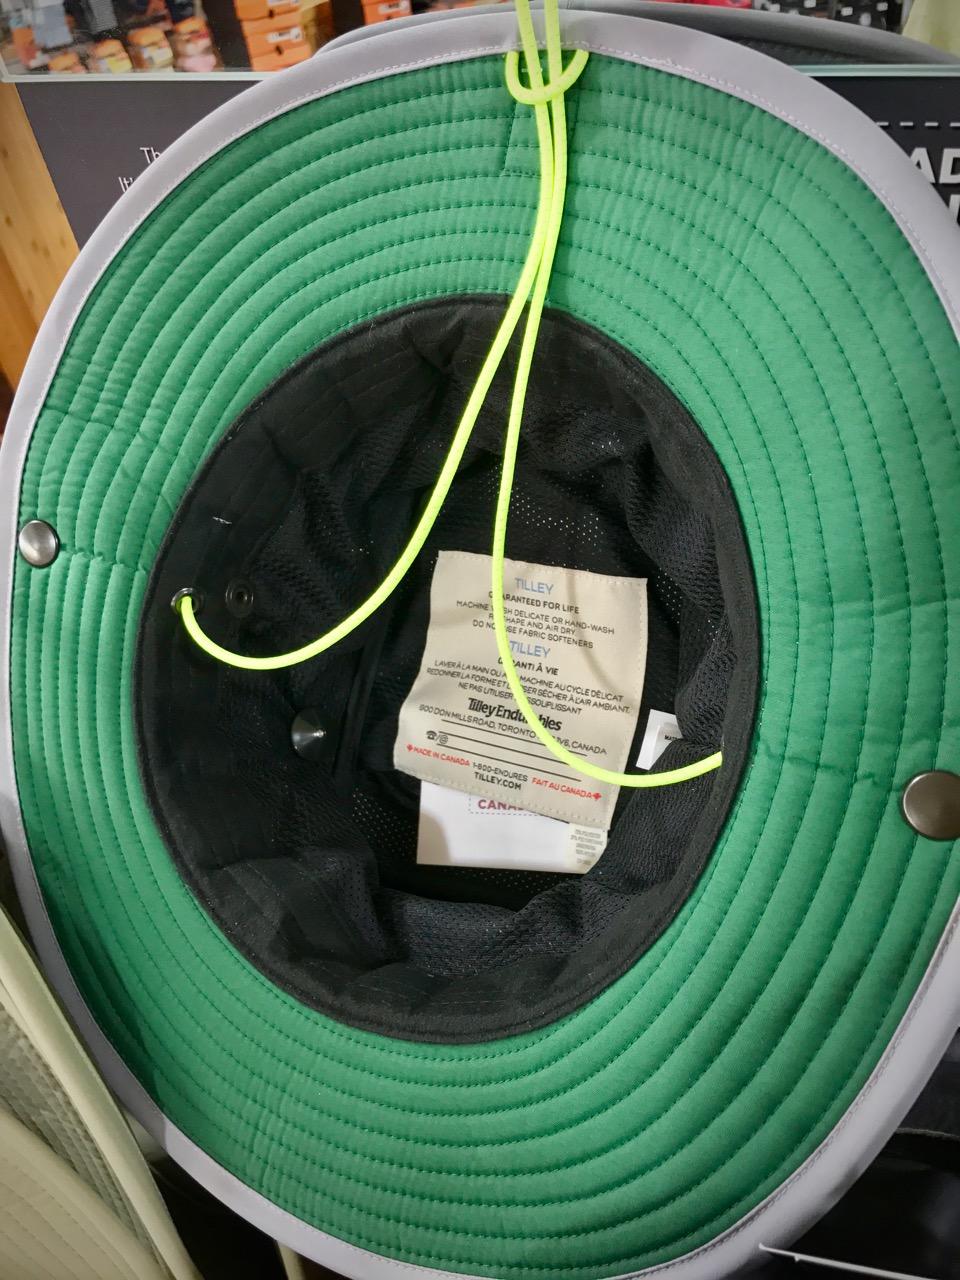 bdd756a0 New From Tilley: Paddler's Hat — Traversing